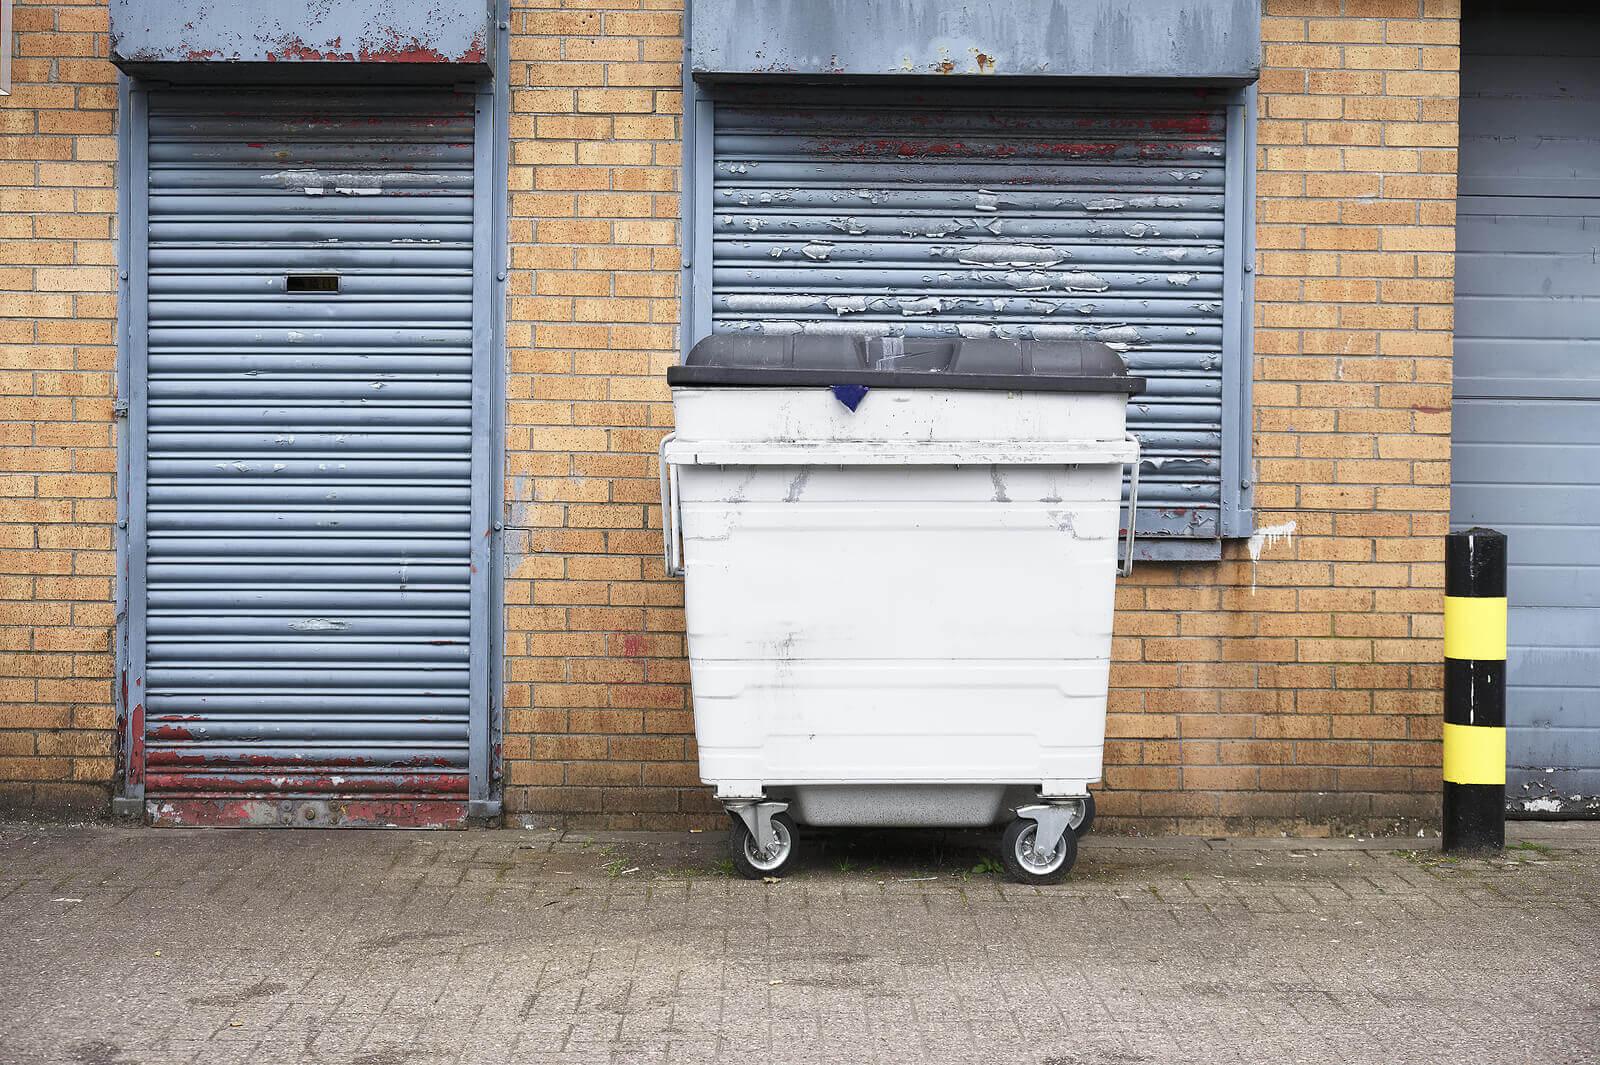 A white metal wheelie bin located in the street outside a shuttered shop window and doorway